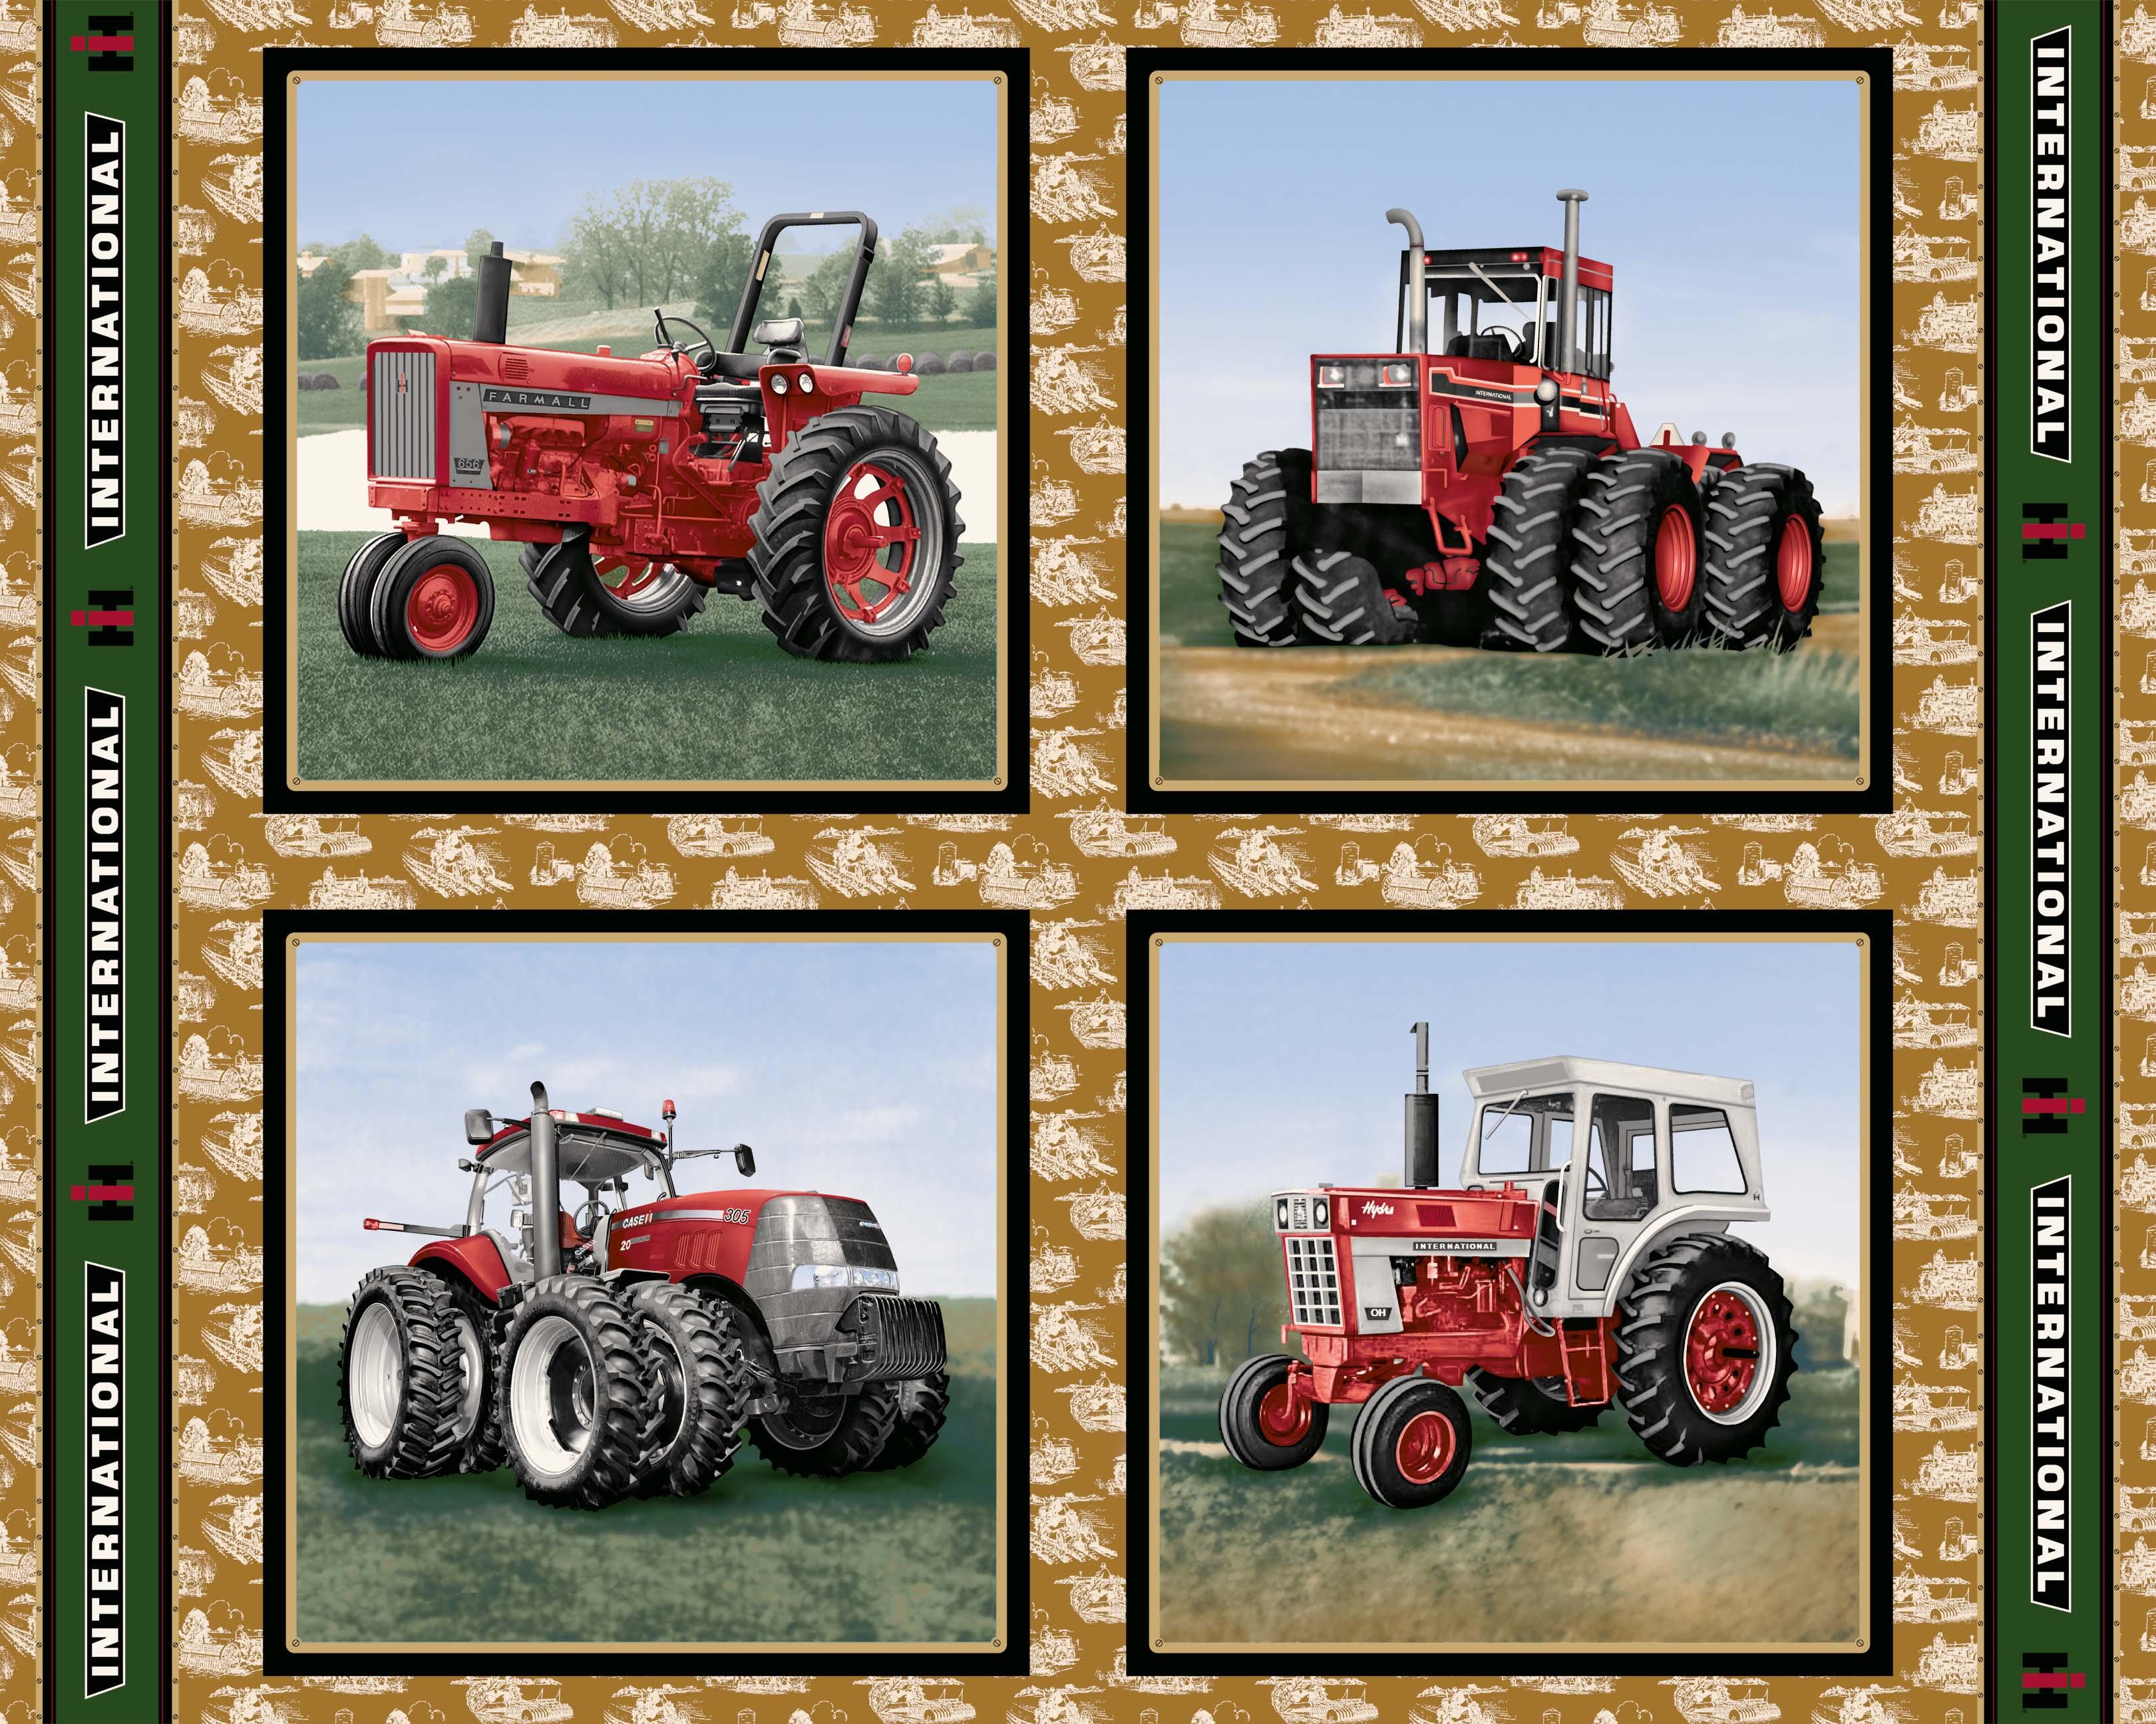 Case International Tractor Fabric : New international harvester and farmall fabrics now